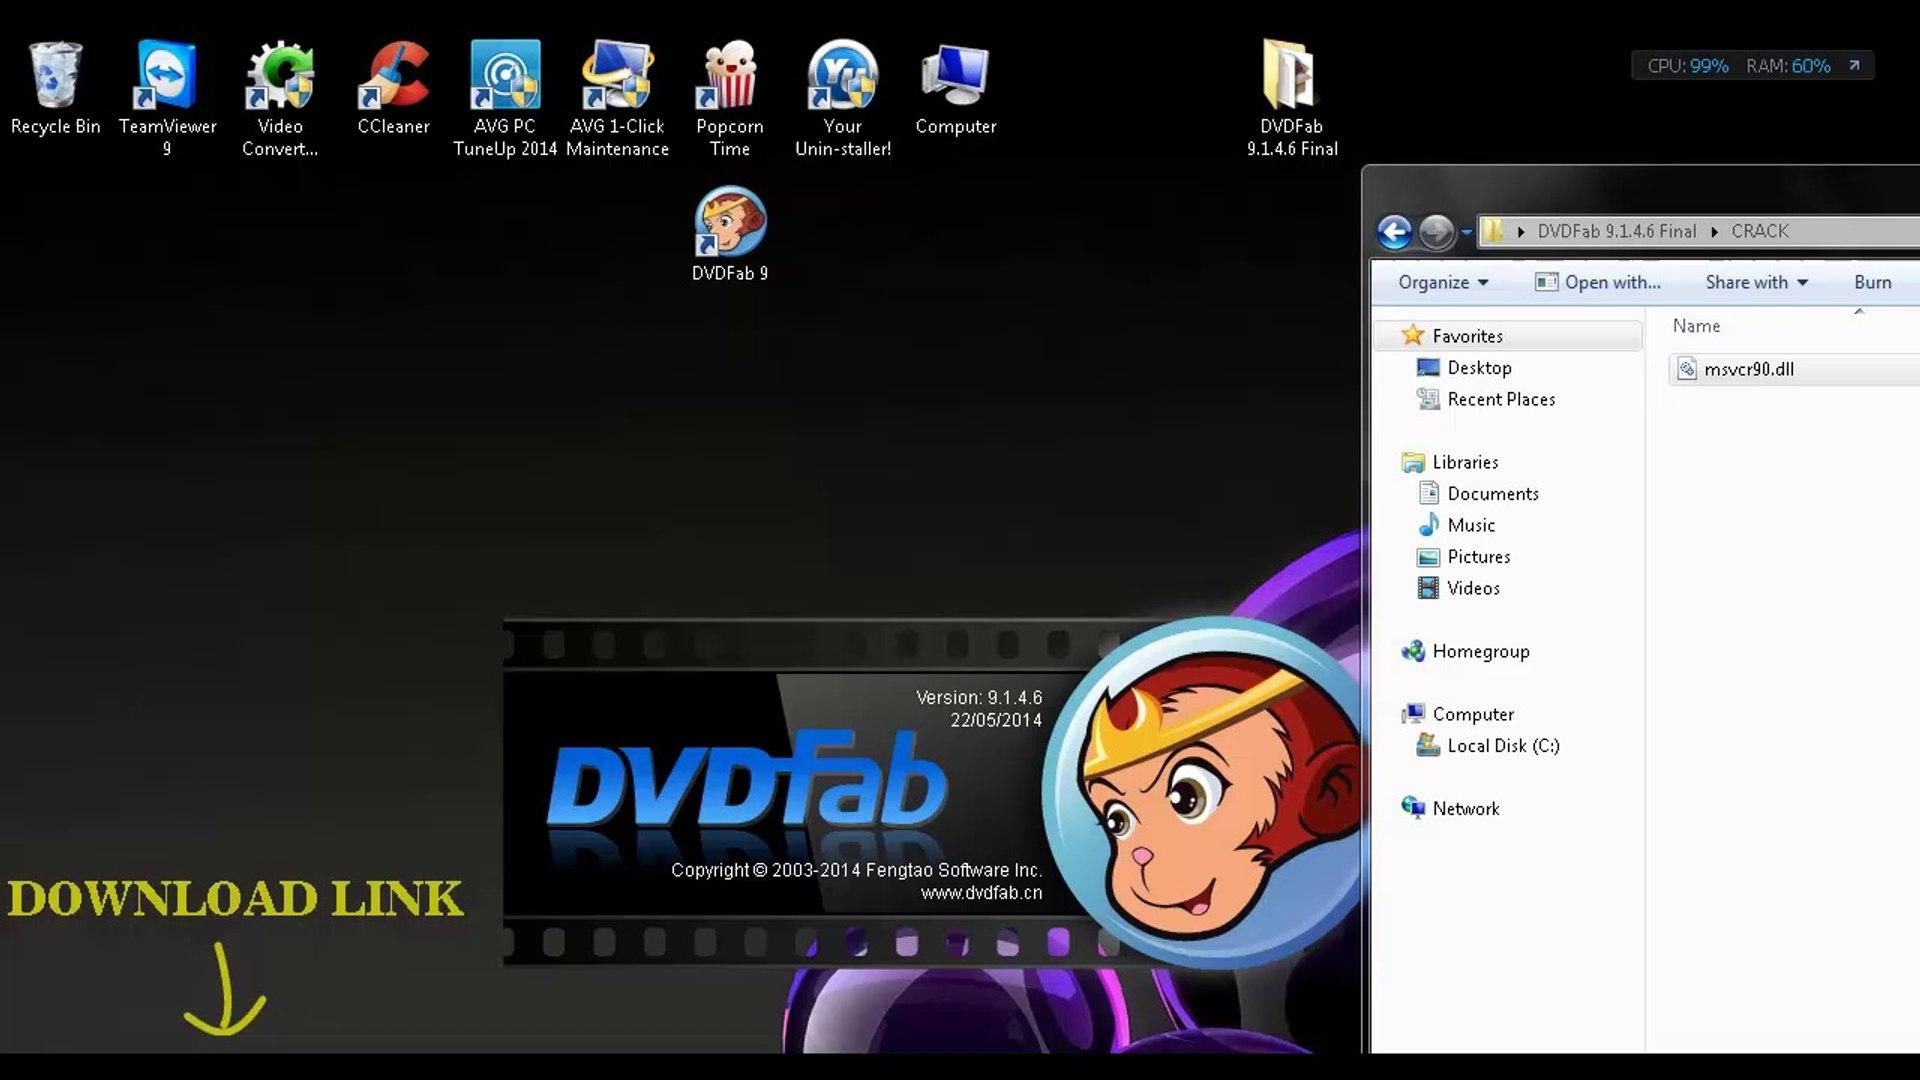 dvdfeb media player pro crack torrent